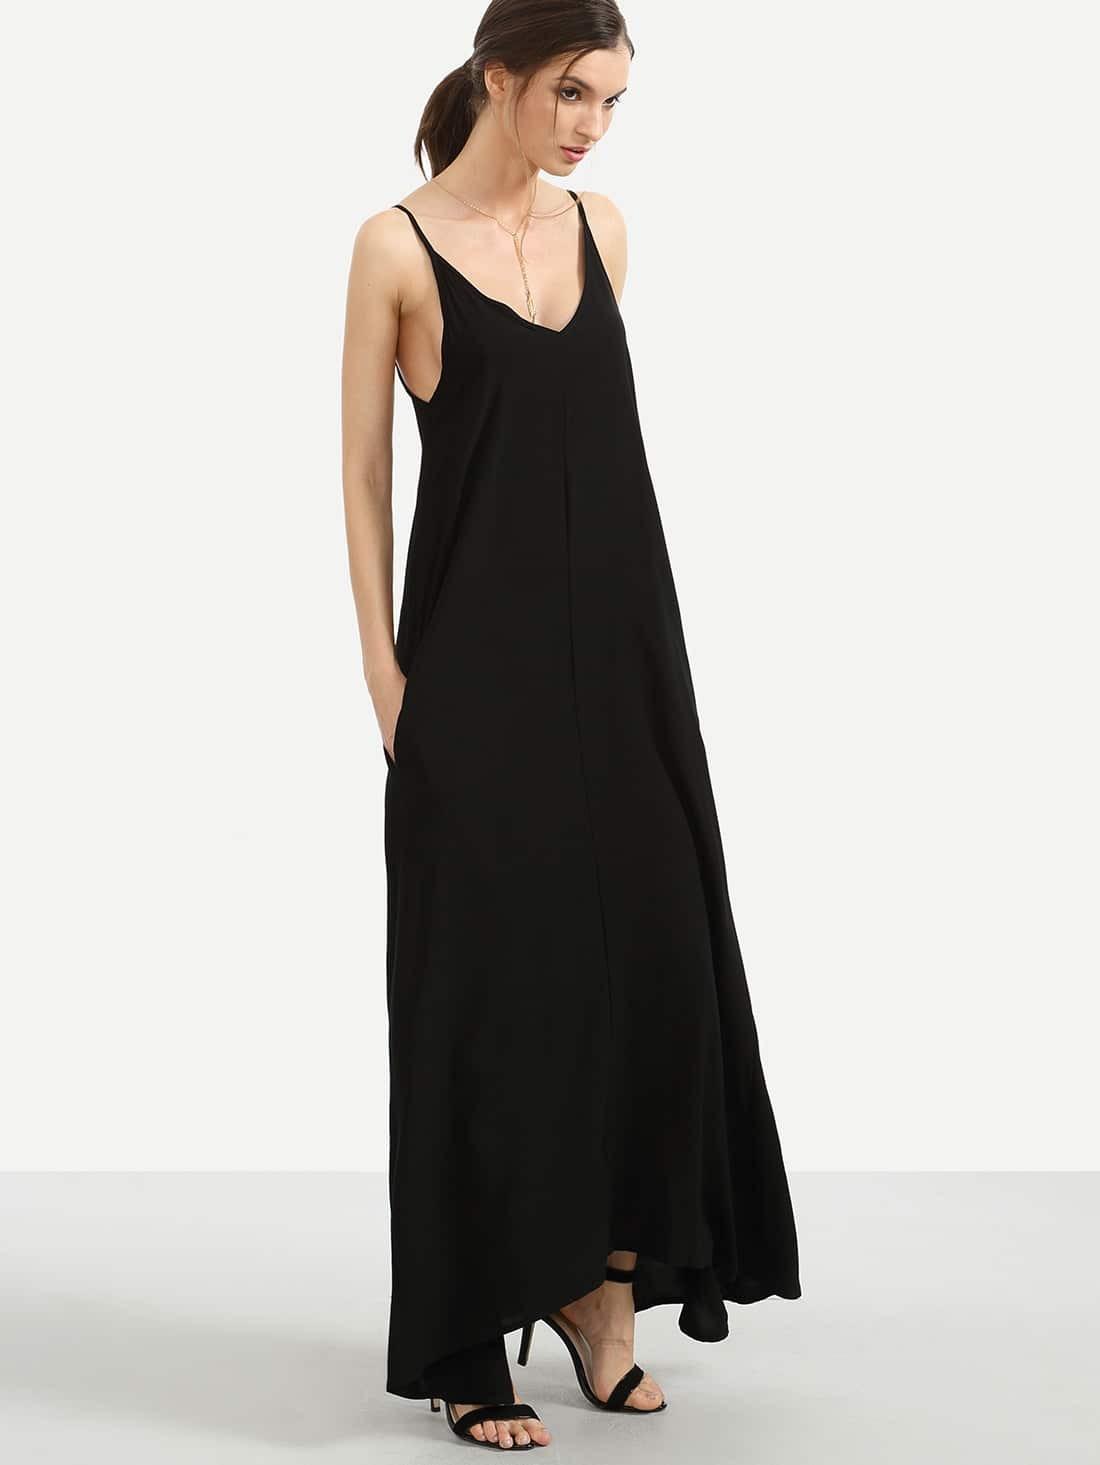 robe longue d contract bretelle avec poches noir french romwe. Black Bedroom Furniture Sets. Home Design Ideas